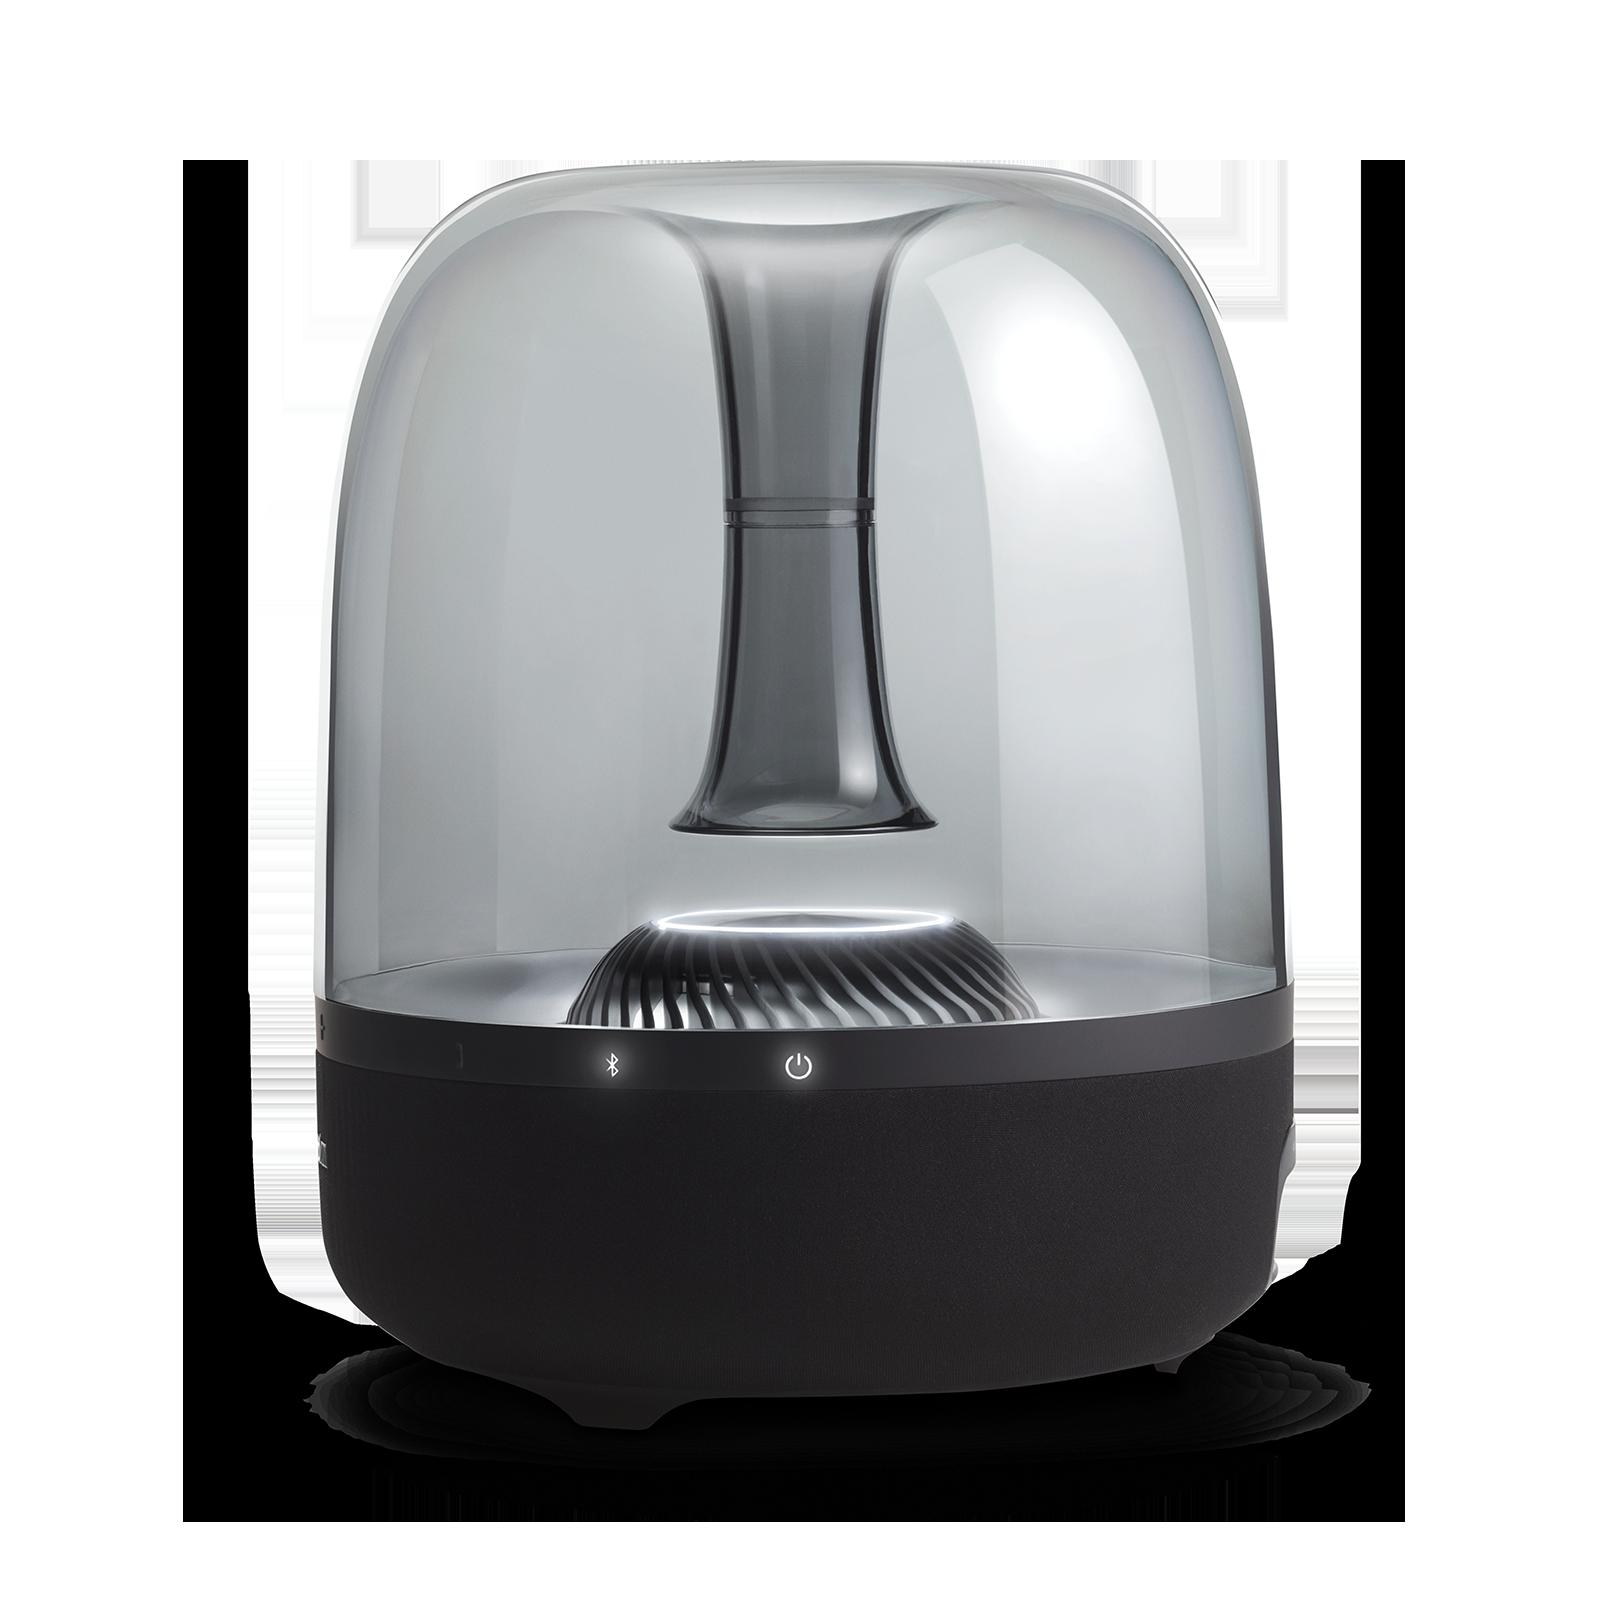 AURA STUDIO 2 - Black - Wireless speaker with ambient lighting - Detailshot 2